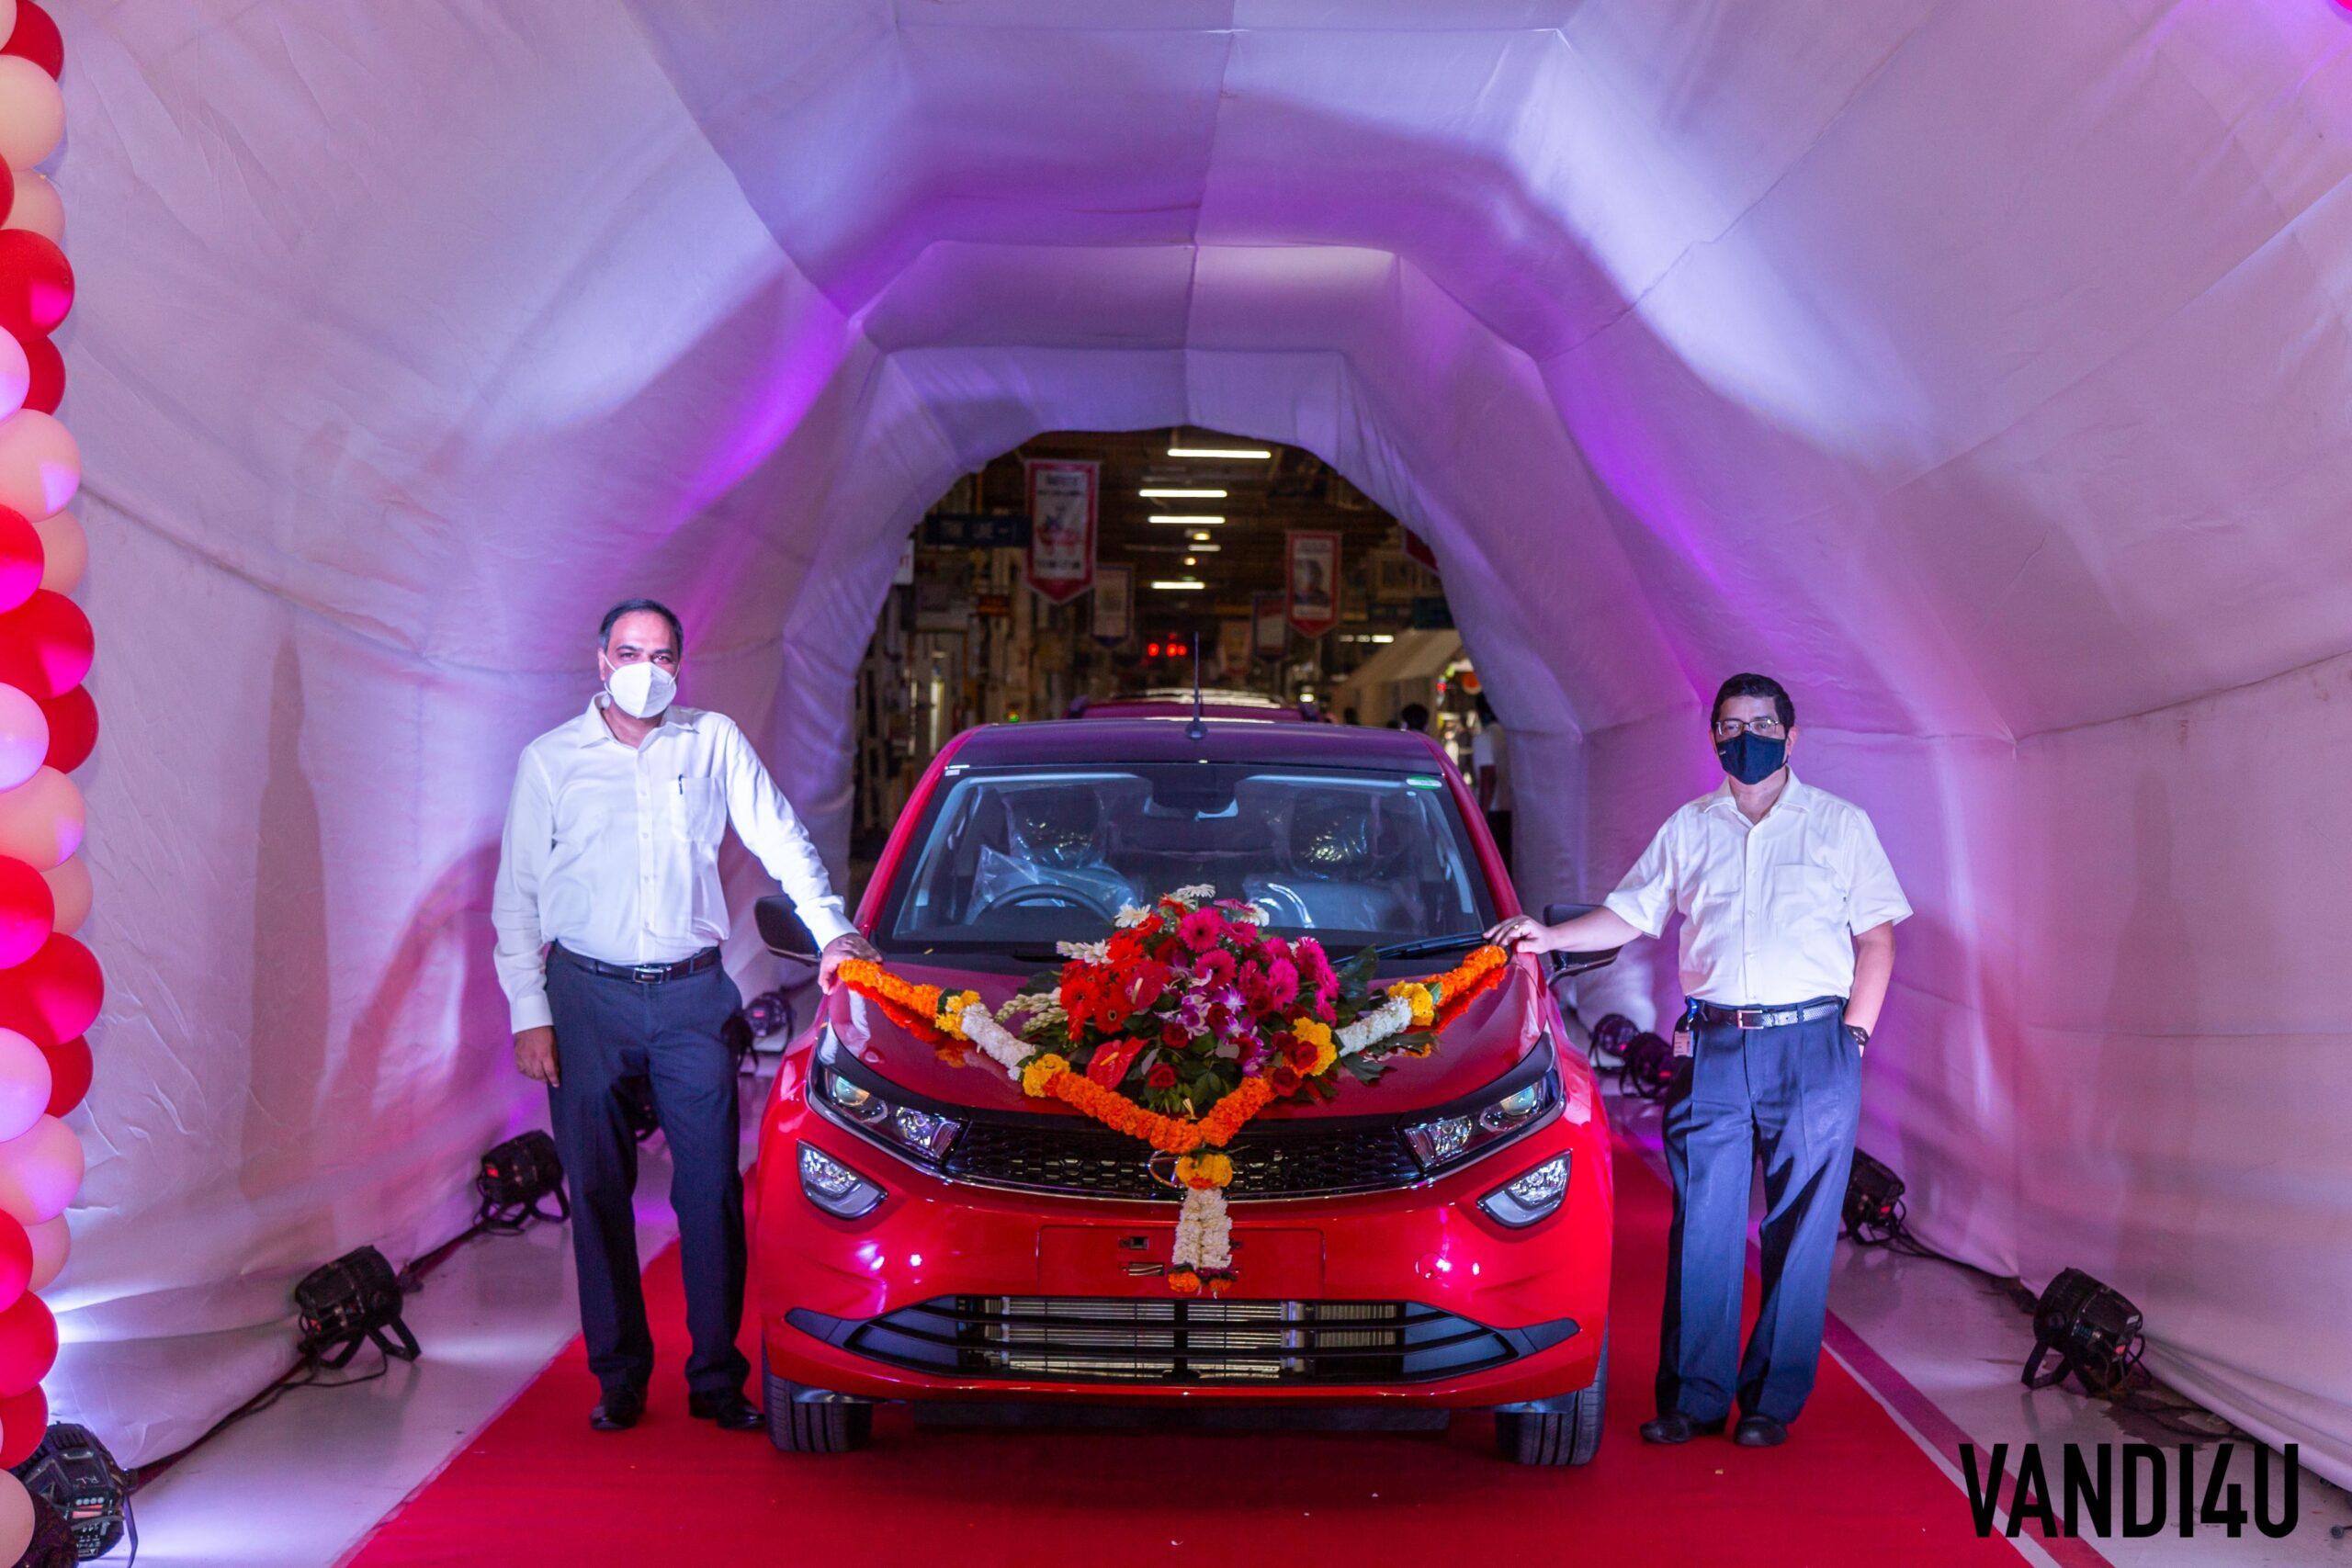 Tata Motors Passenger Vehicles clocks 4 Million production milestone in India   Vandi4u